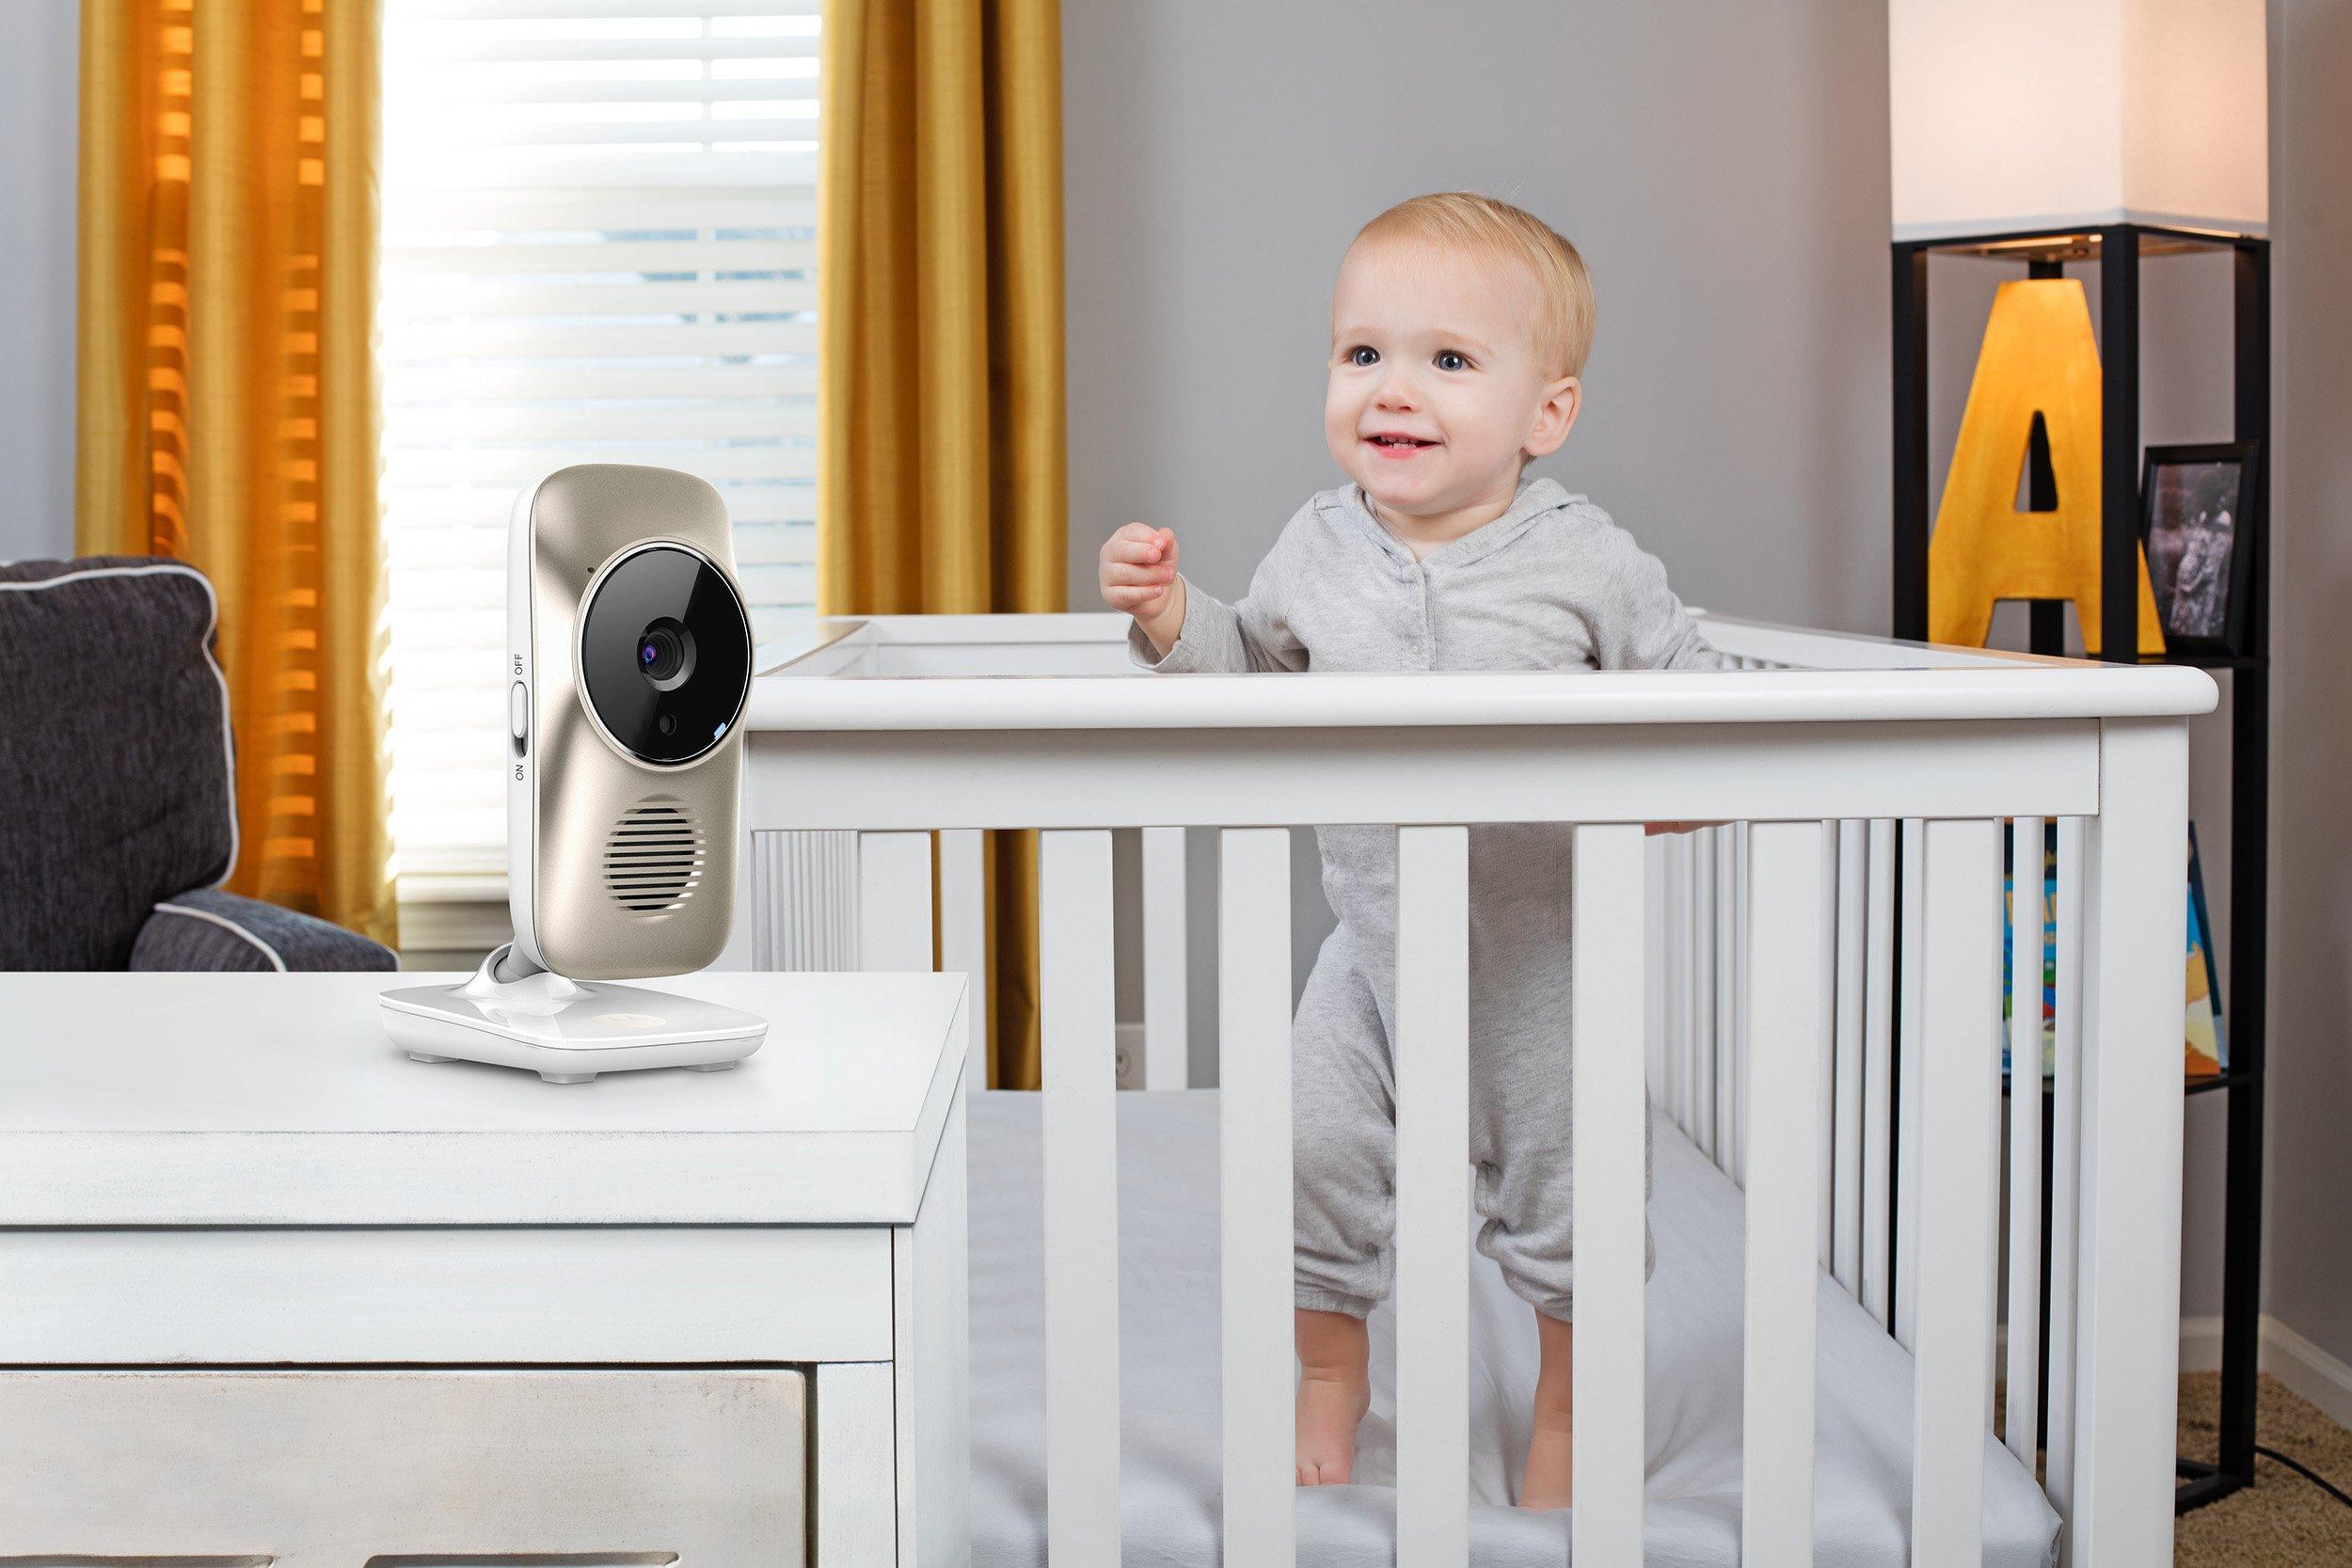 Motorola Wi-Fi Baby Video Monitor with LCD Screen Motorola MBP 845 Bianco